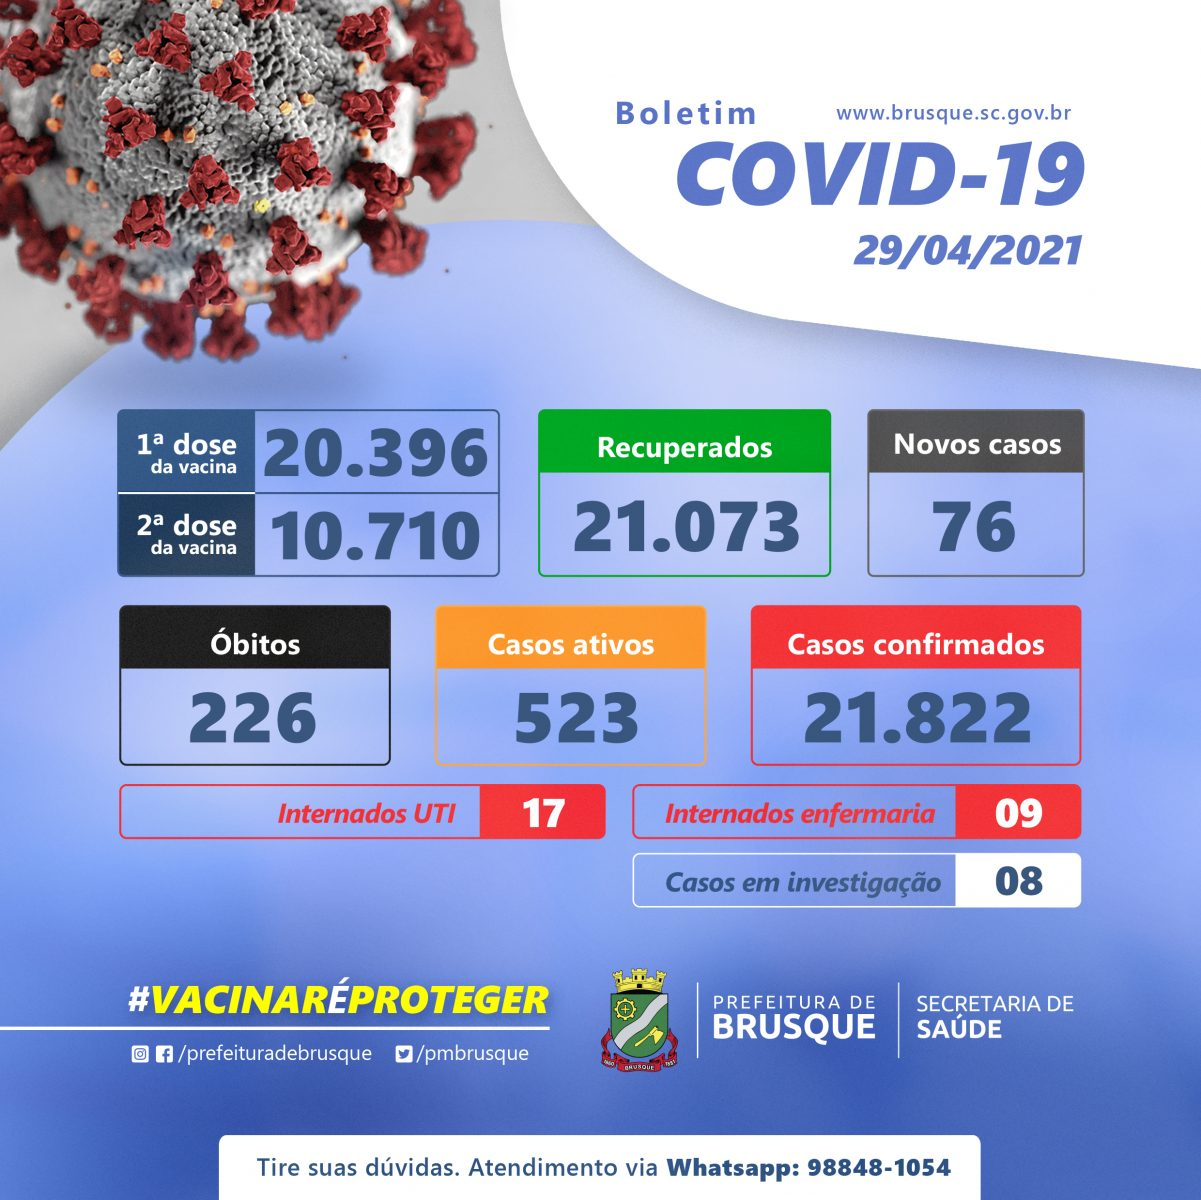 Covid 19: Confira o boletim epidemiológico desta quinta-feira (29)